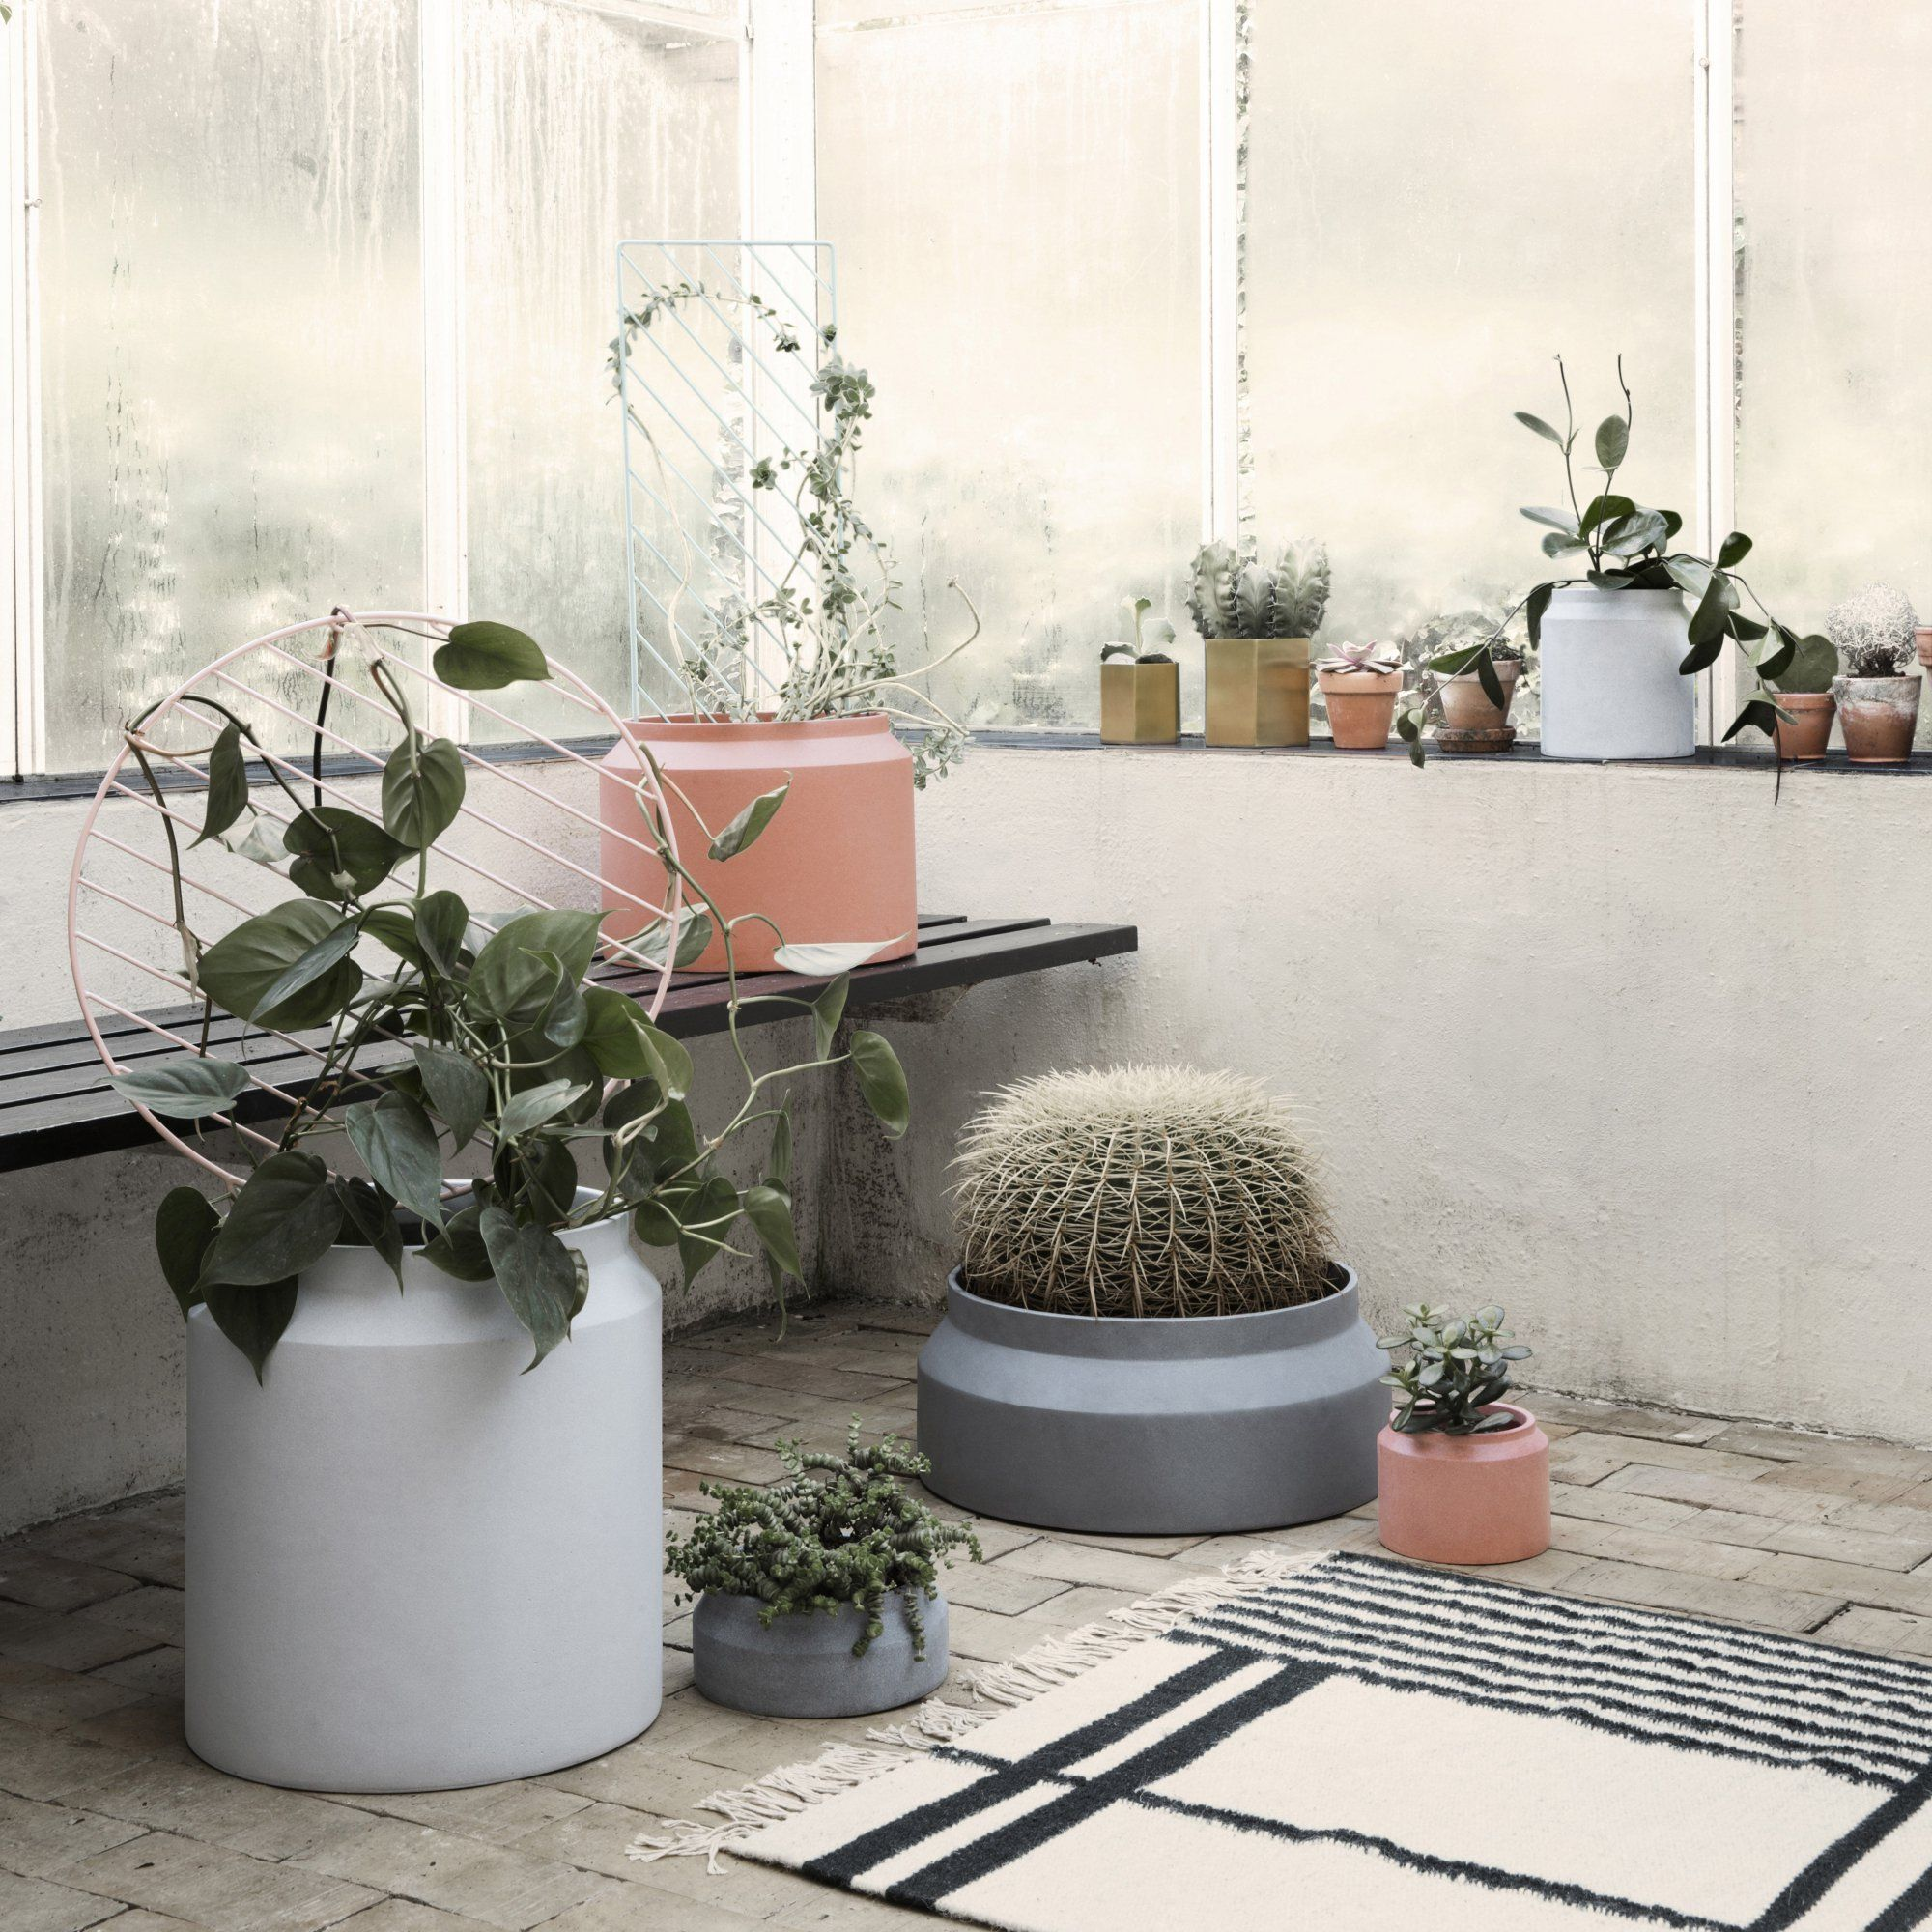 des pots de fleurs terracotta design et moderne. Black Bedroom Furniture Sets. Home Design Ideas